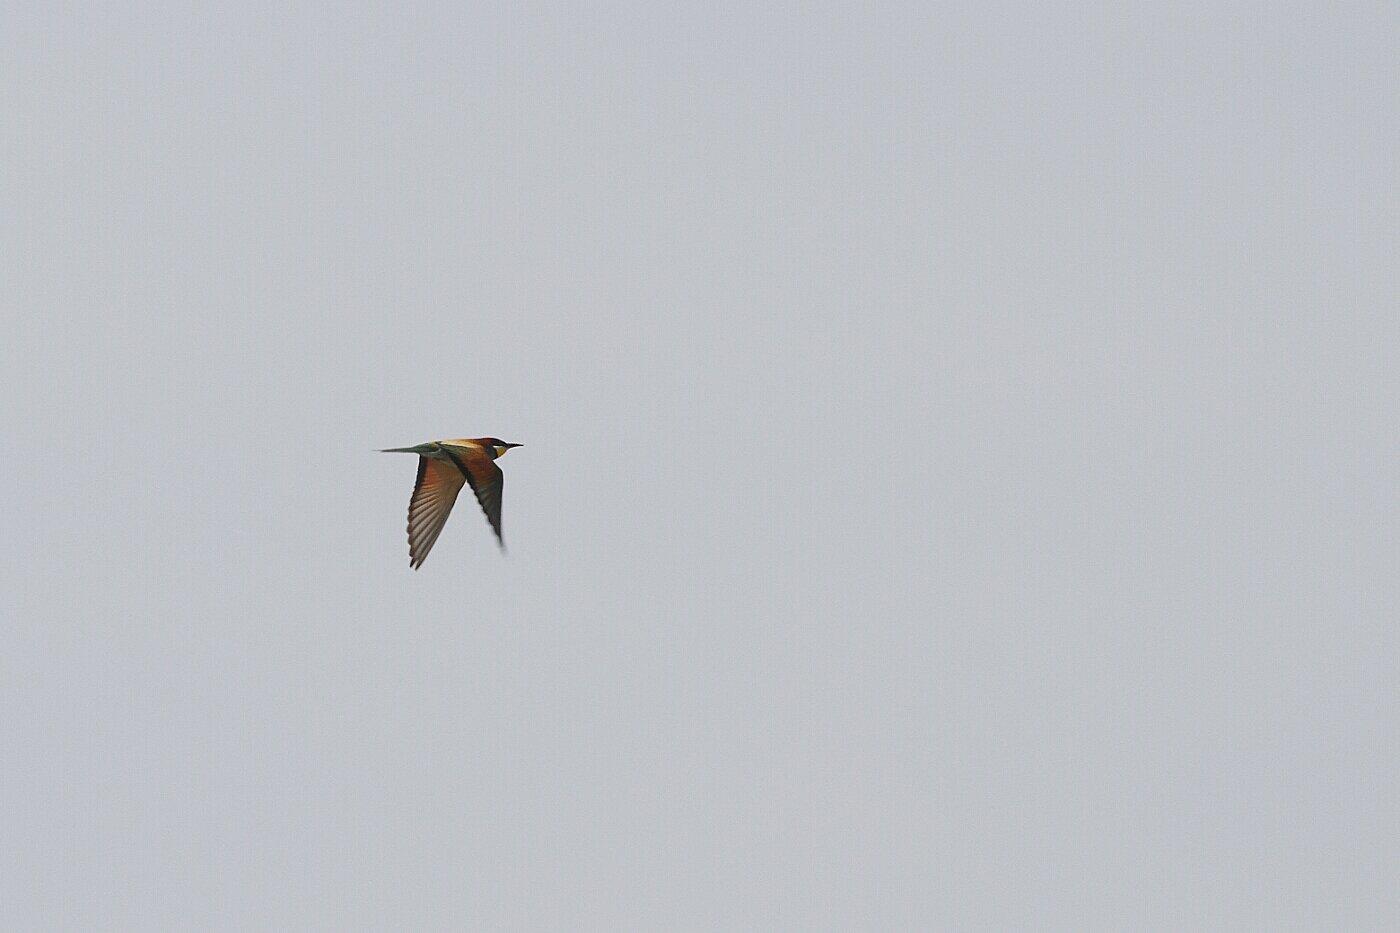 Lesbos oiseaux 07 - Guêpier d'Europe